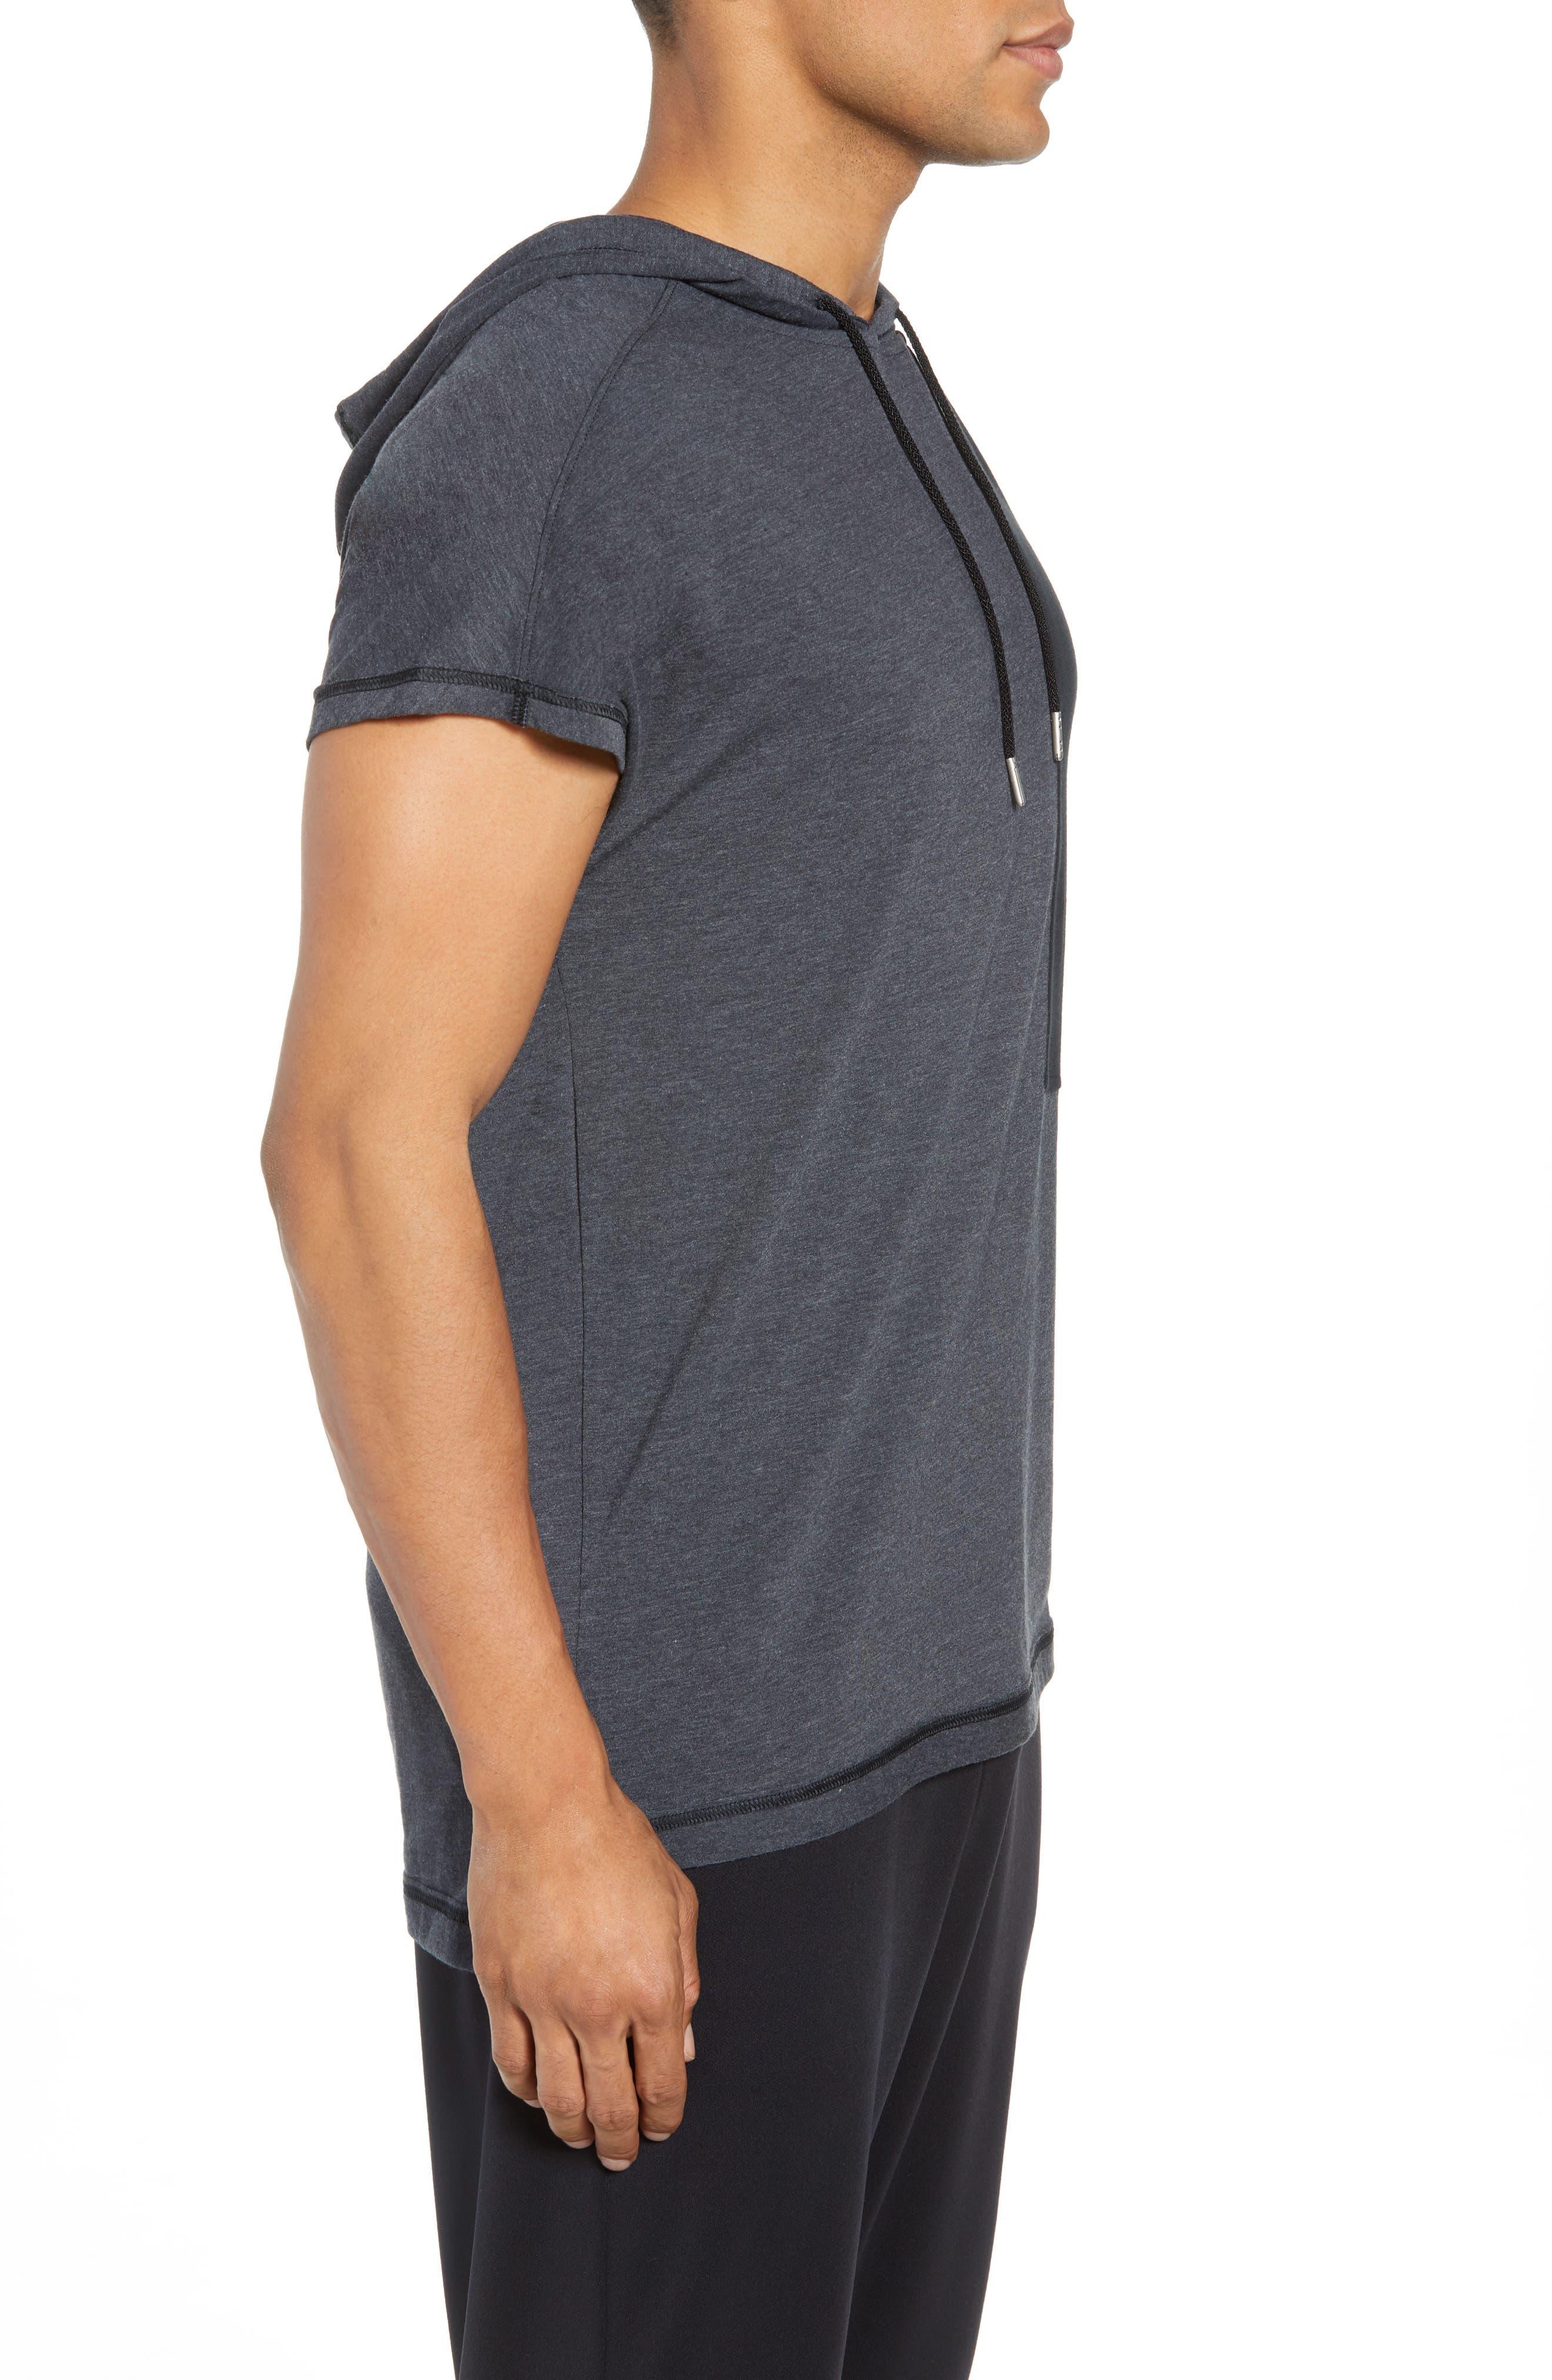 Pursuit Short Sleeve Hoodie,                             Alternate thumbnail 3, color,                             Black/ Black/ Stealth Gray